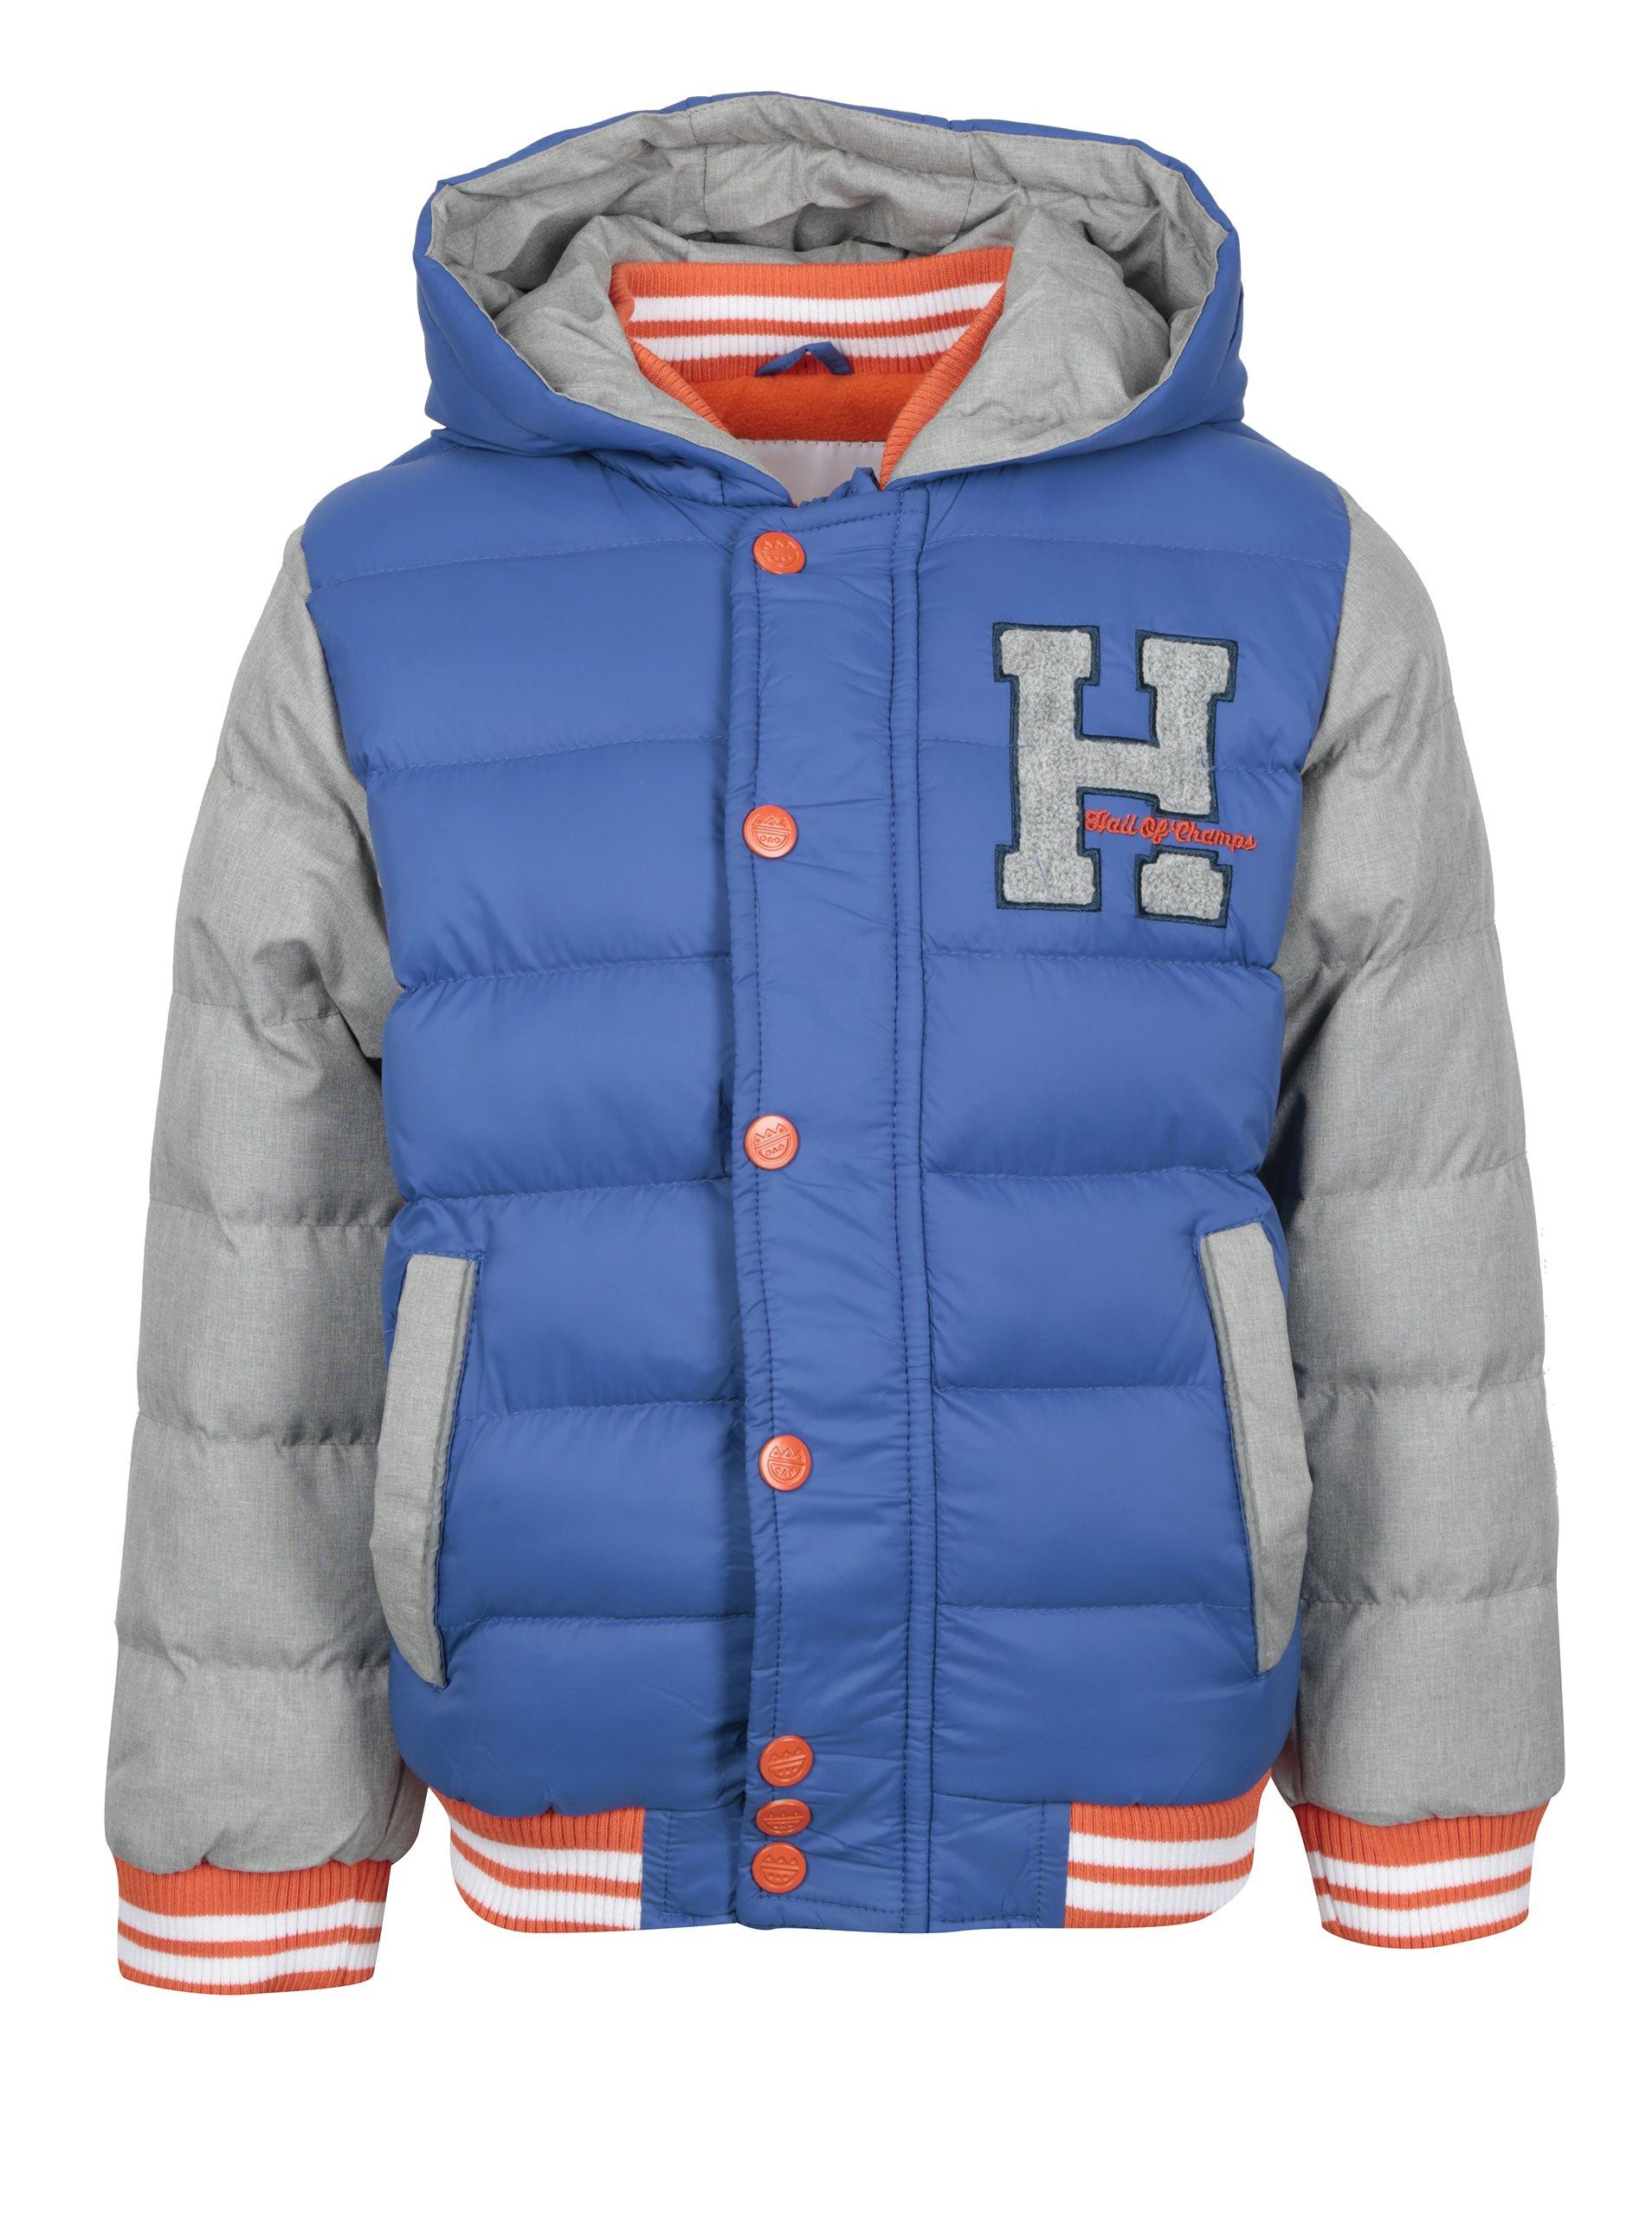 2c6e592af Sivo-modrá chlapčenská prešívaná zimná bunda s kapucňou 5.10.15 ...